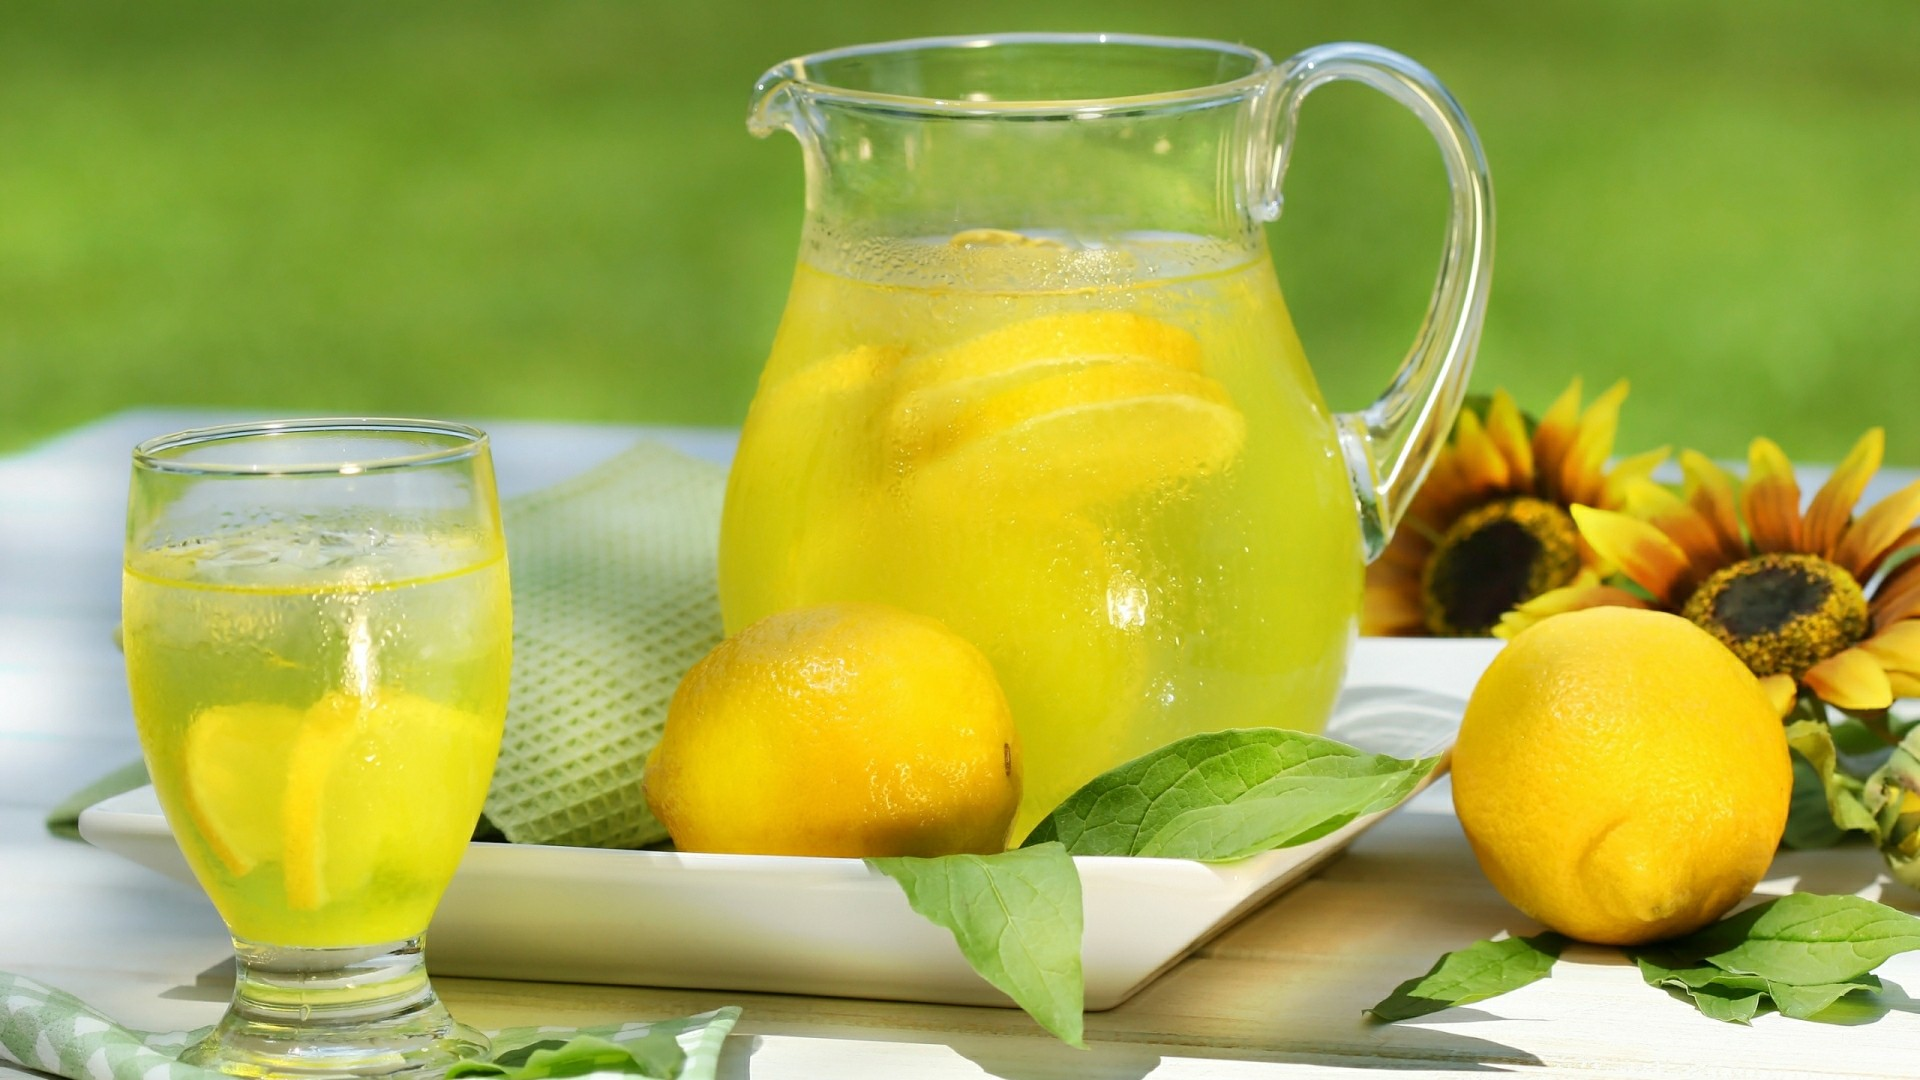 Lemon juice wallpaper